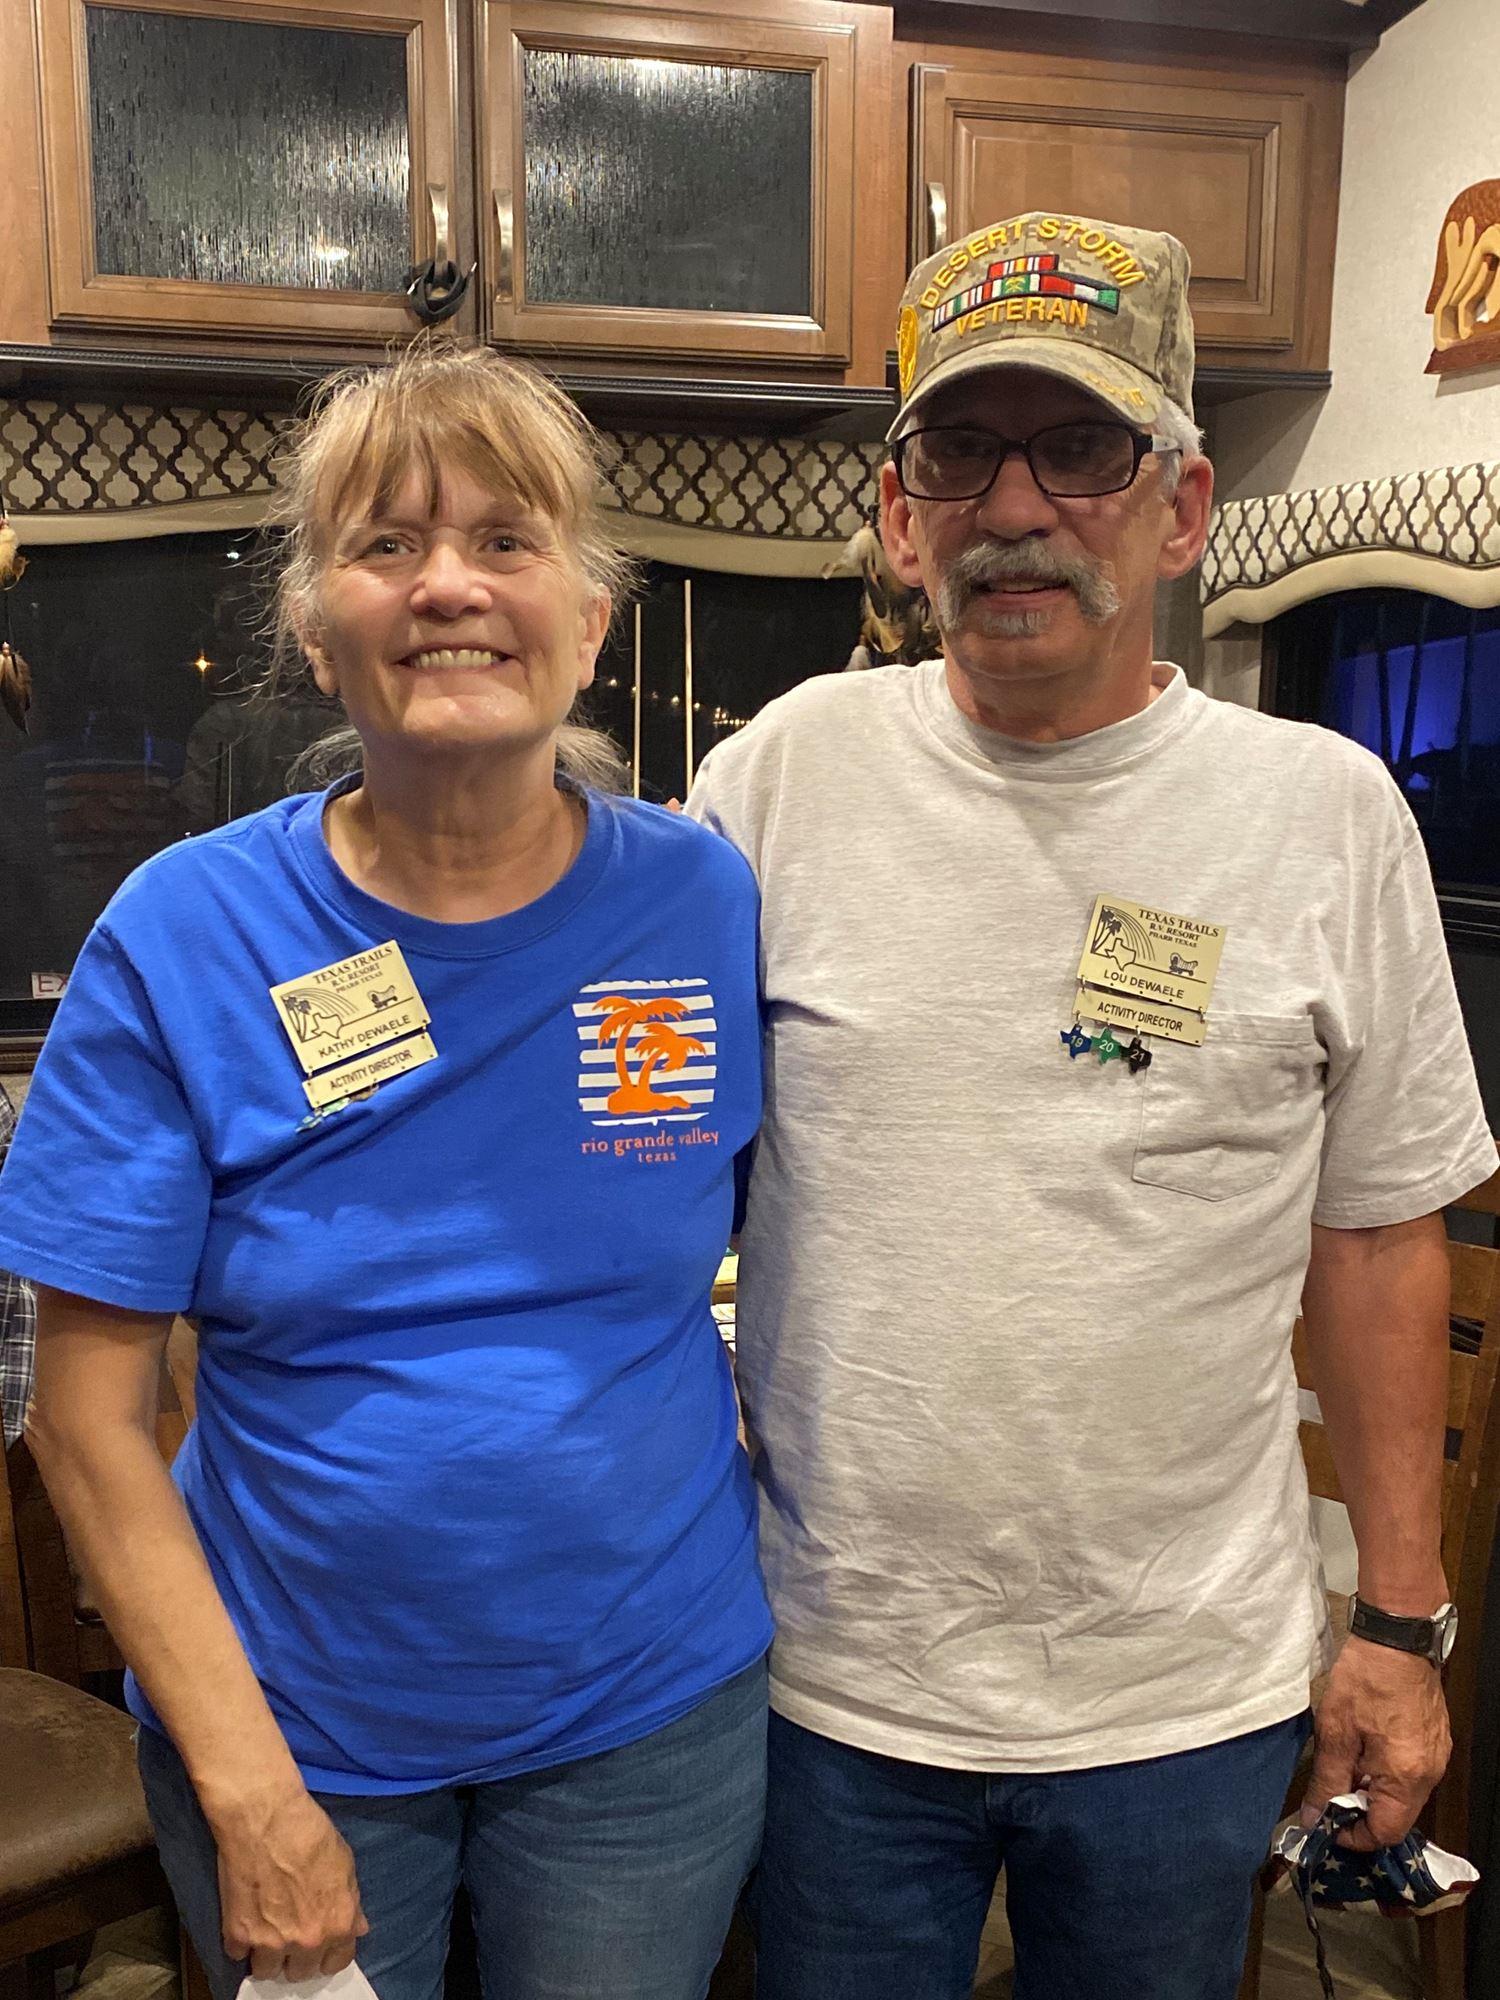 Kathy and Lou Dewaele